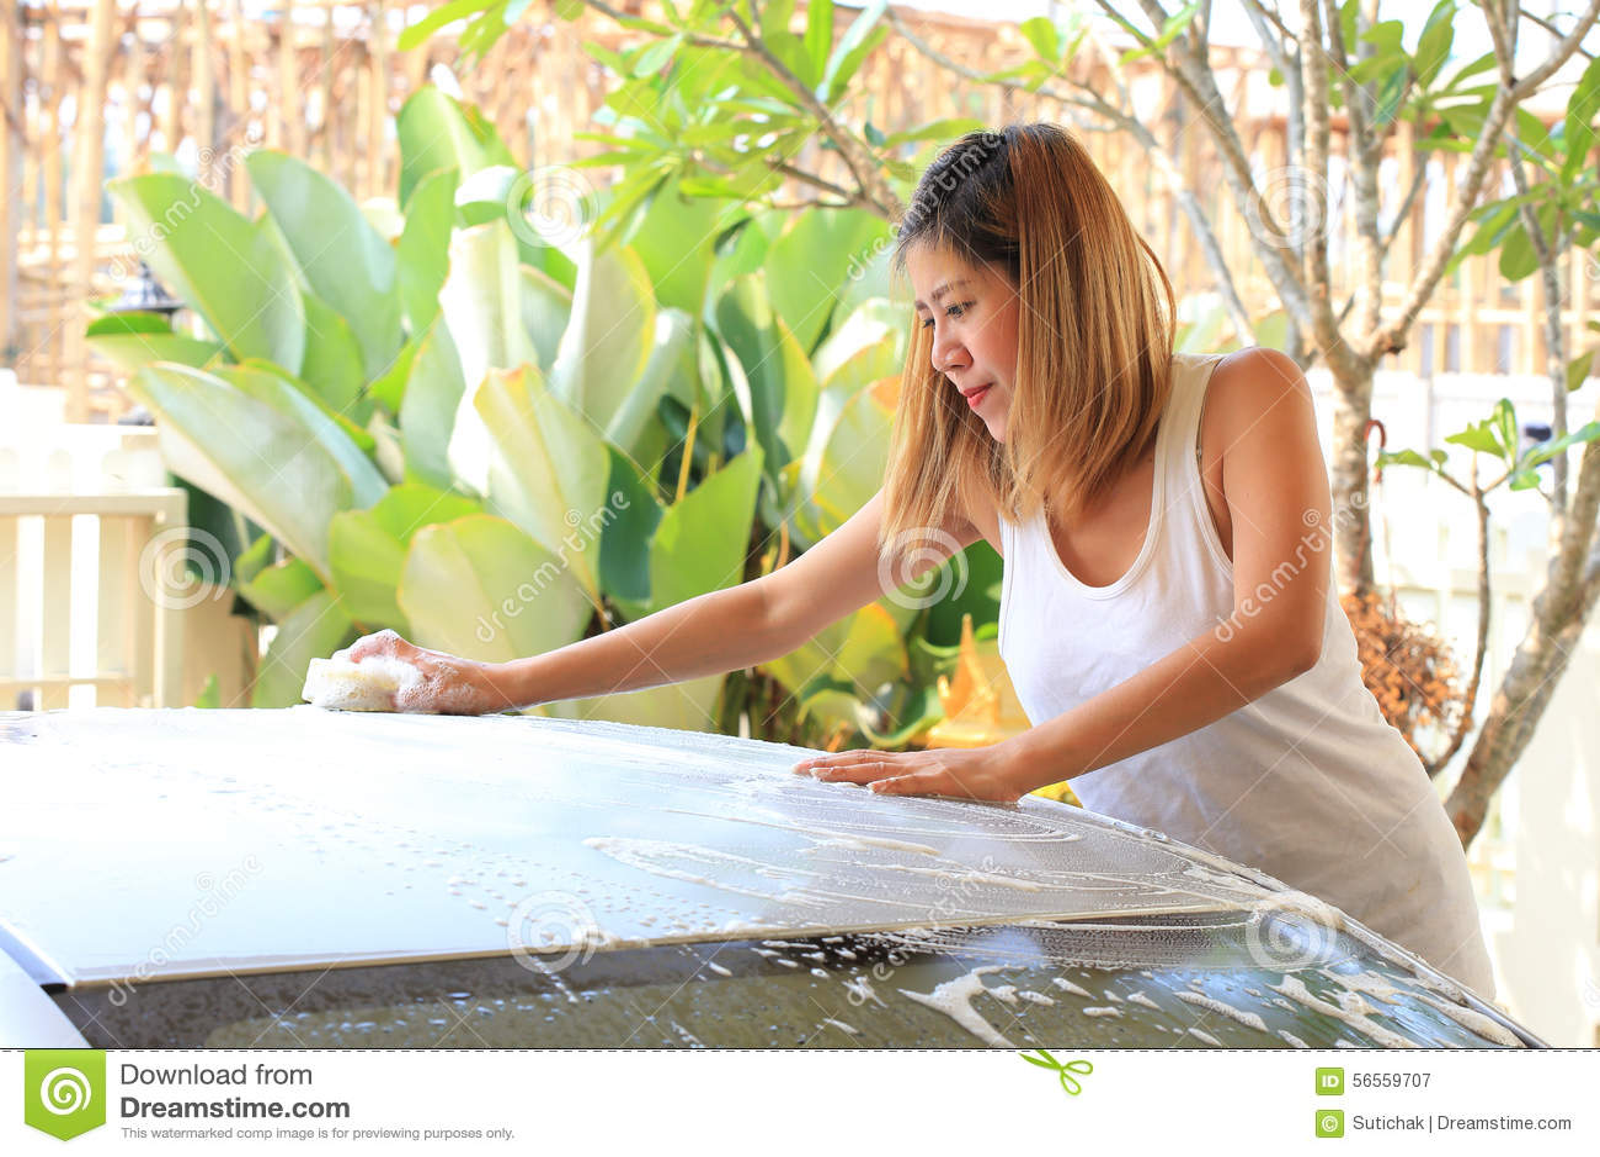 Download Πλύσιμο αυτοκινήτων, αυτοκίνητο πλύσης γυναικών Στοκ Εικόνα - εικόνα από γκρίζος, σφουγγάρι: 56559707